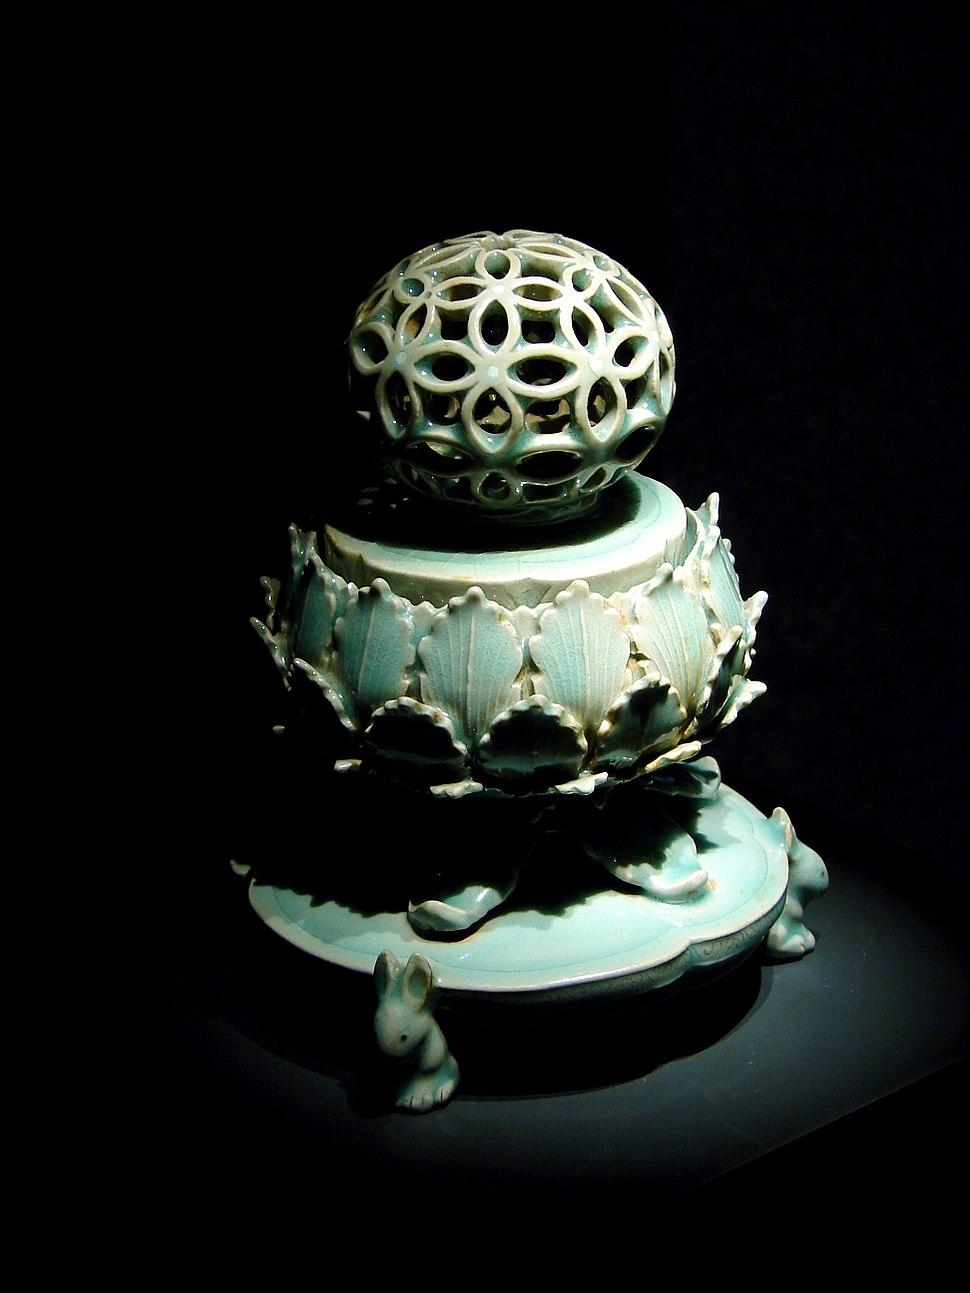 Korea - Seoul - National Museum - Incense Burner 0252-06a